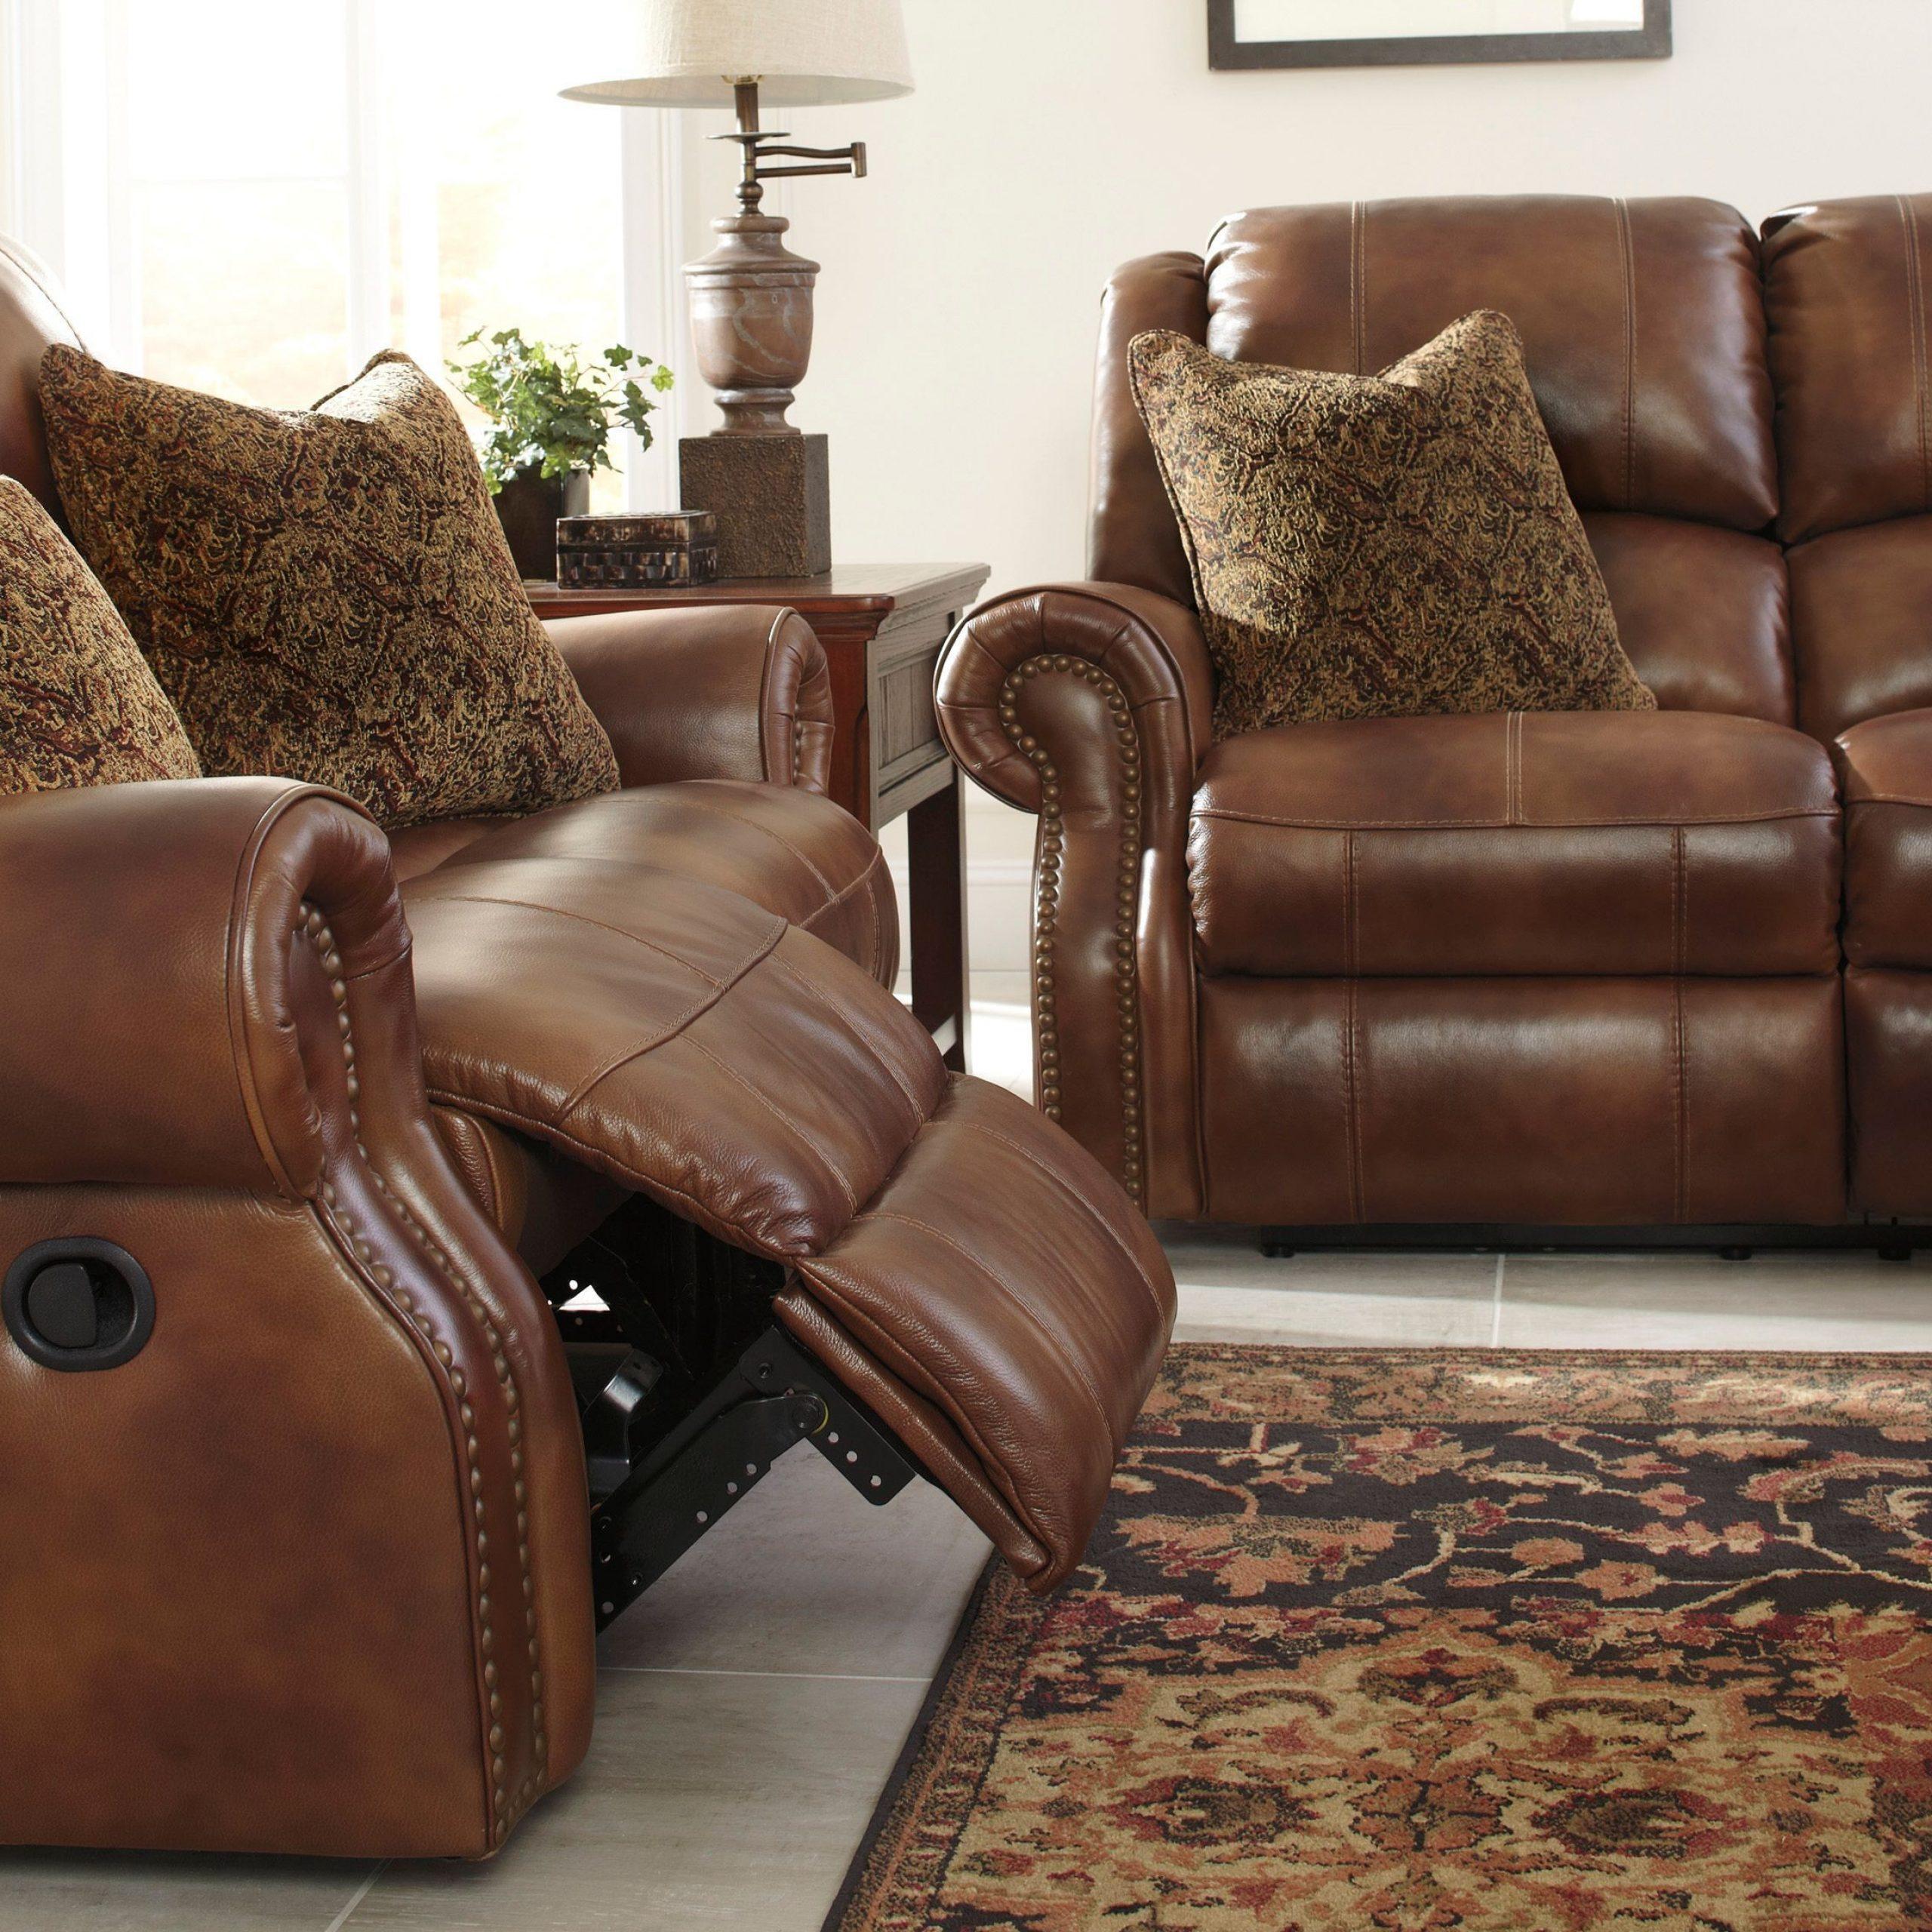 Walworth Auburn Power Reclining Sofa From Ashley (U7800187 Regarding Power Reclining Sofas (View 7 of 15)